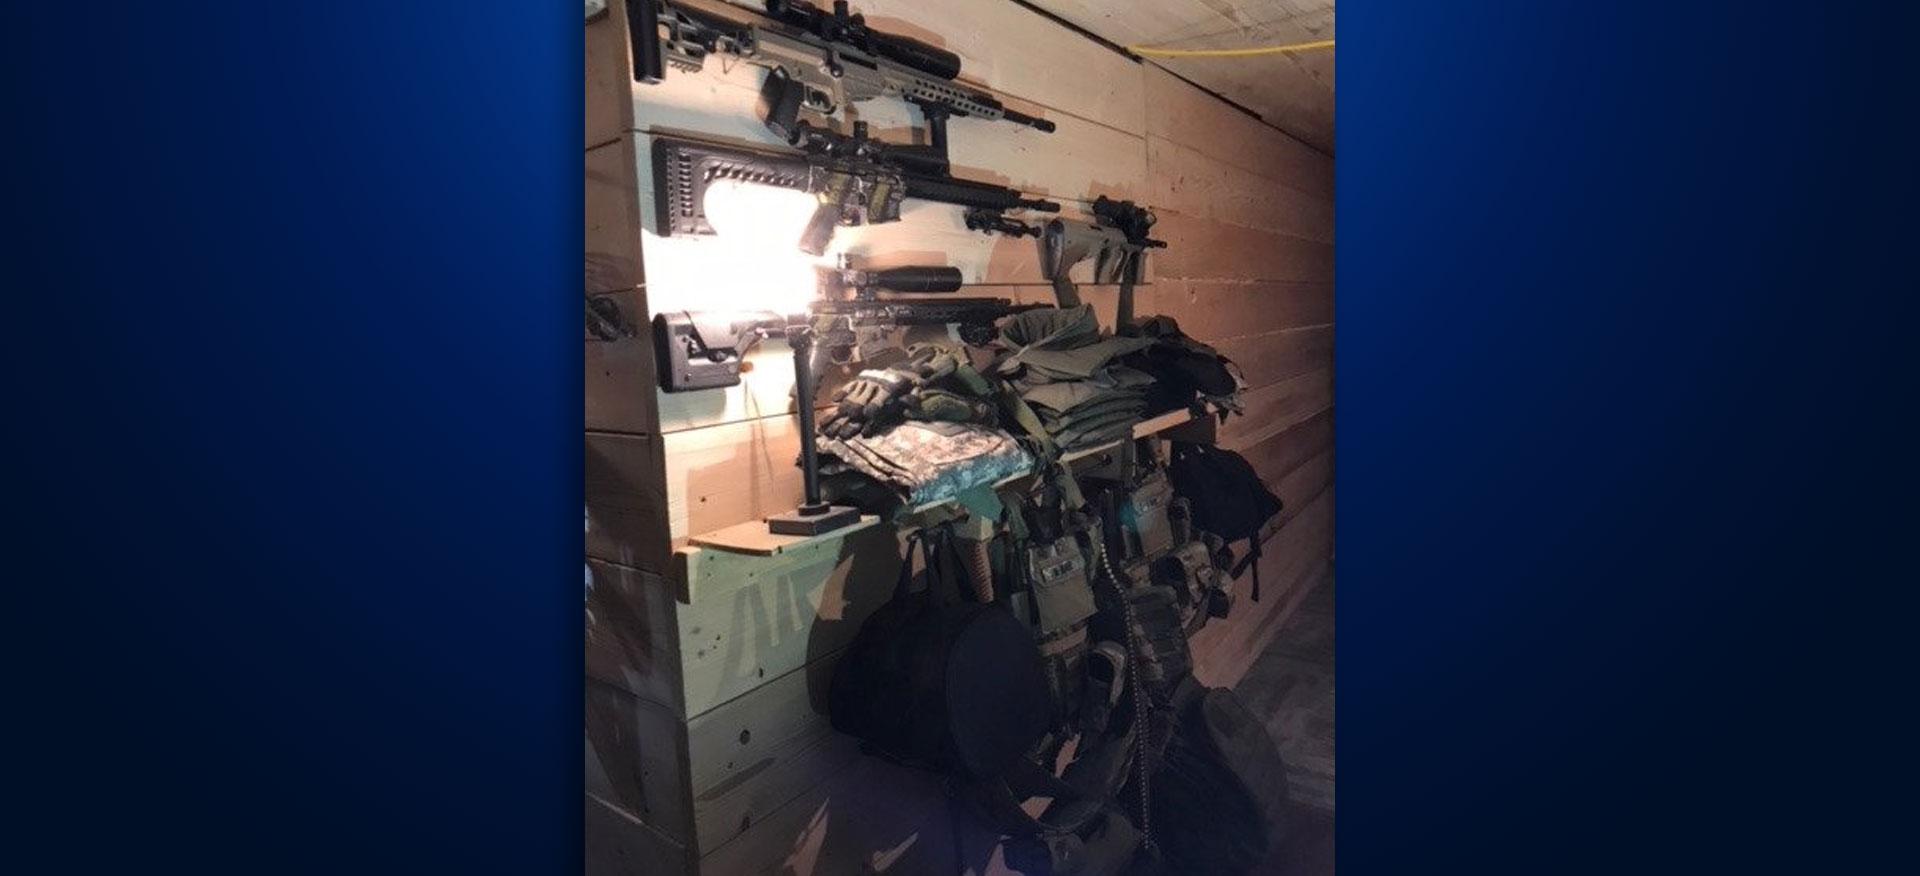 Guns seized Brandon home Artis Kattenburg Iowa shooting